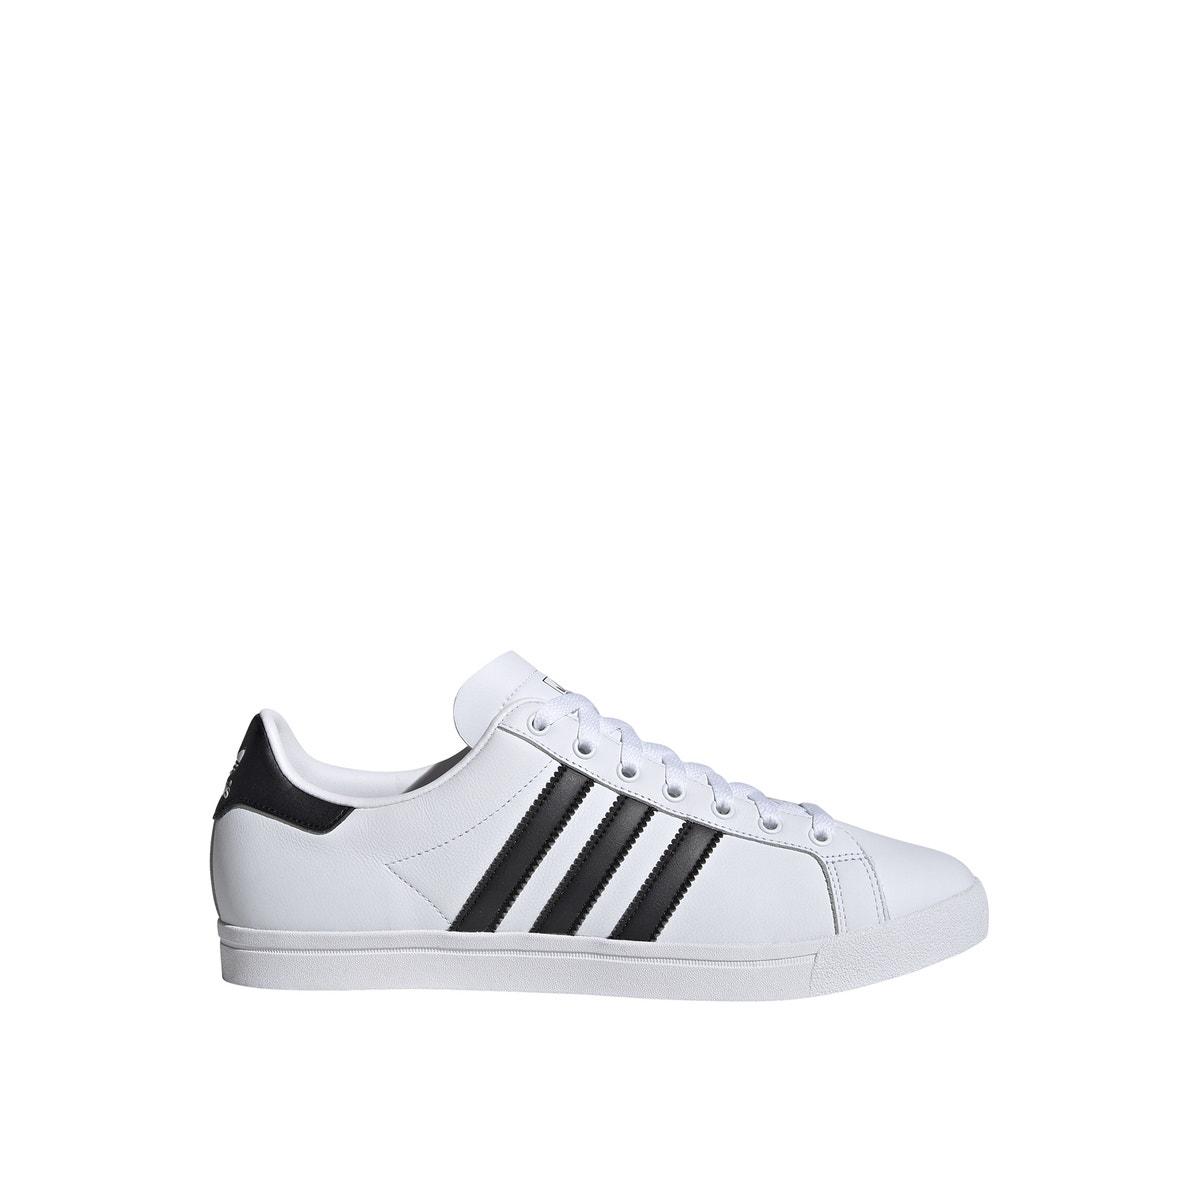 adidas Originals - Δερμάτινα αθλητικά παπούτσια, Coast Star 350152921 - 10465